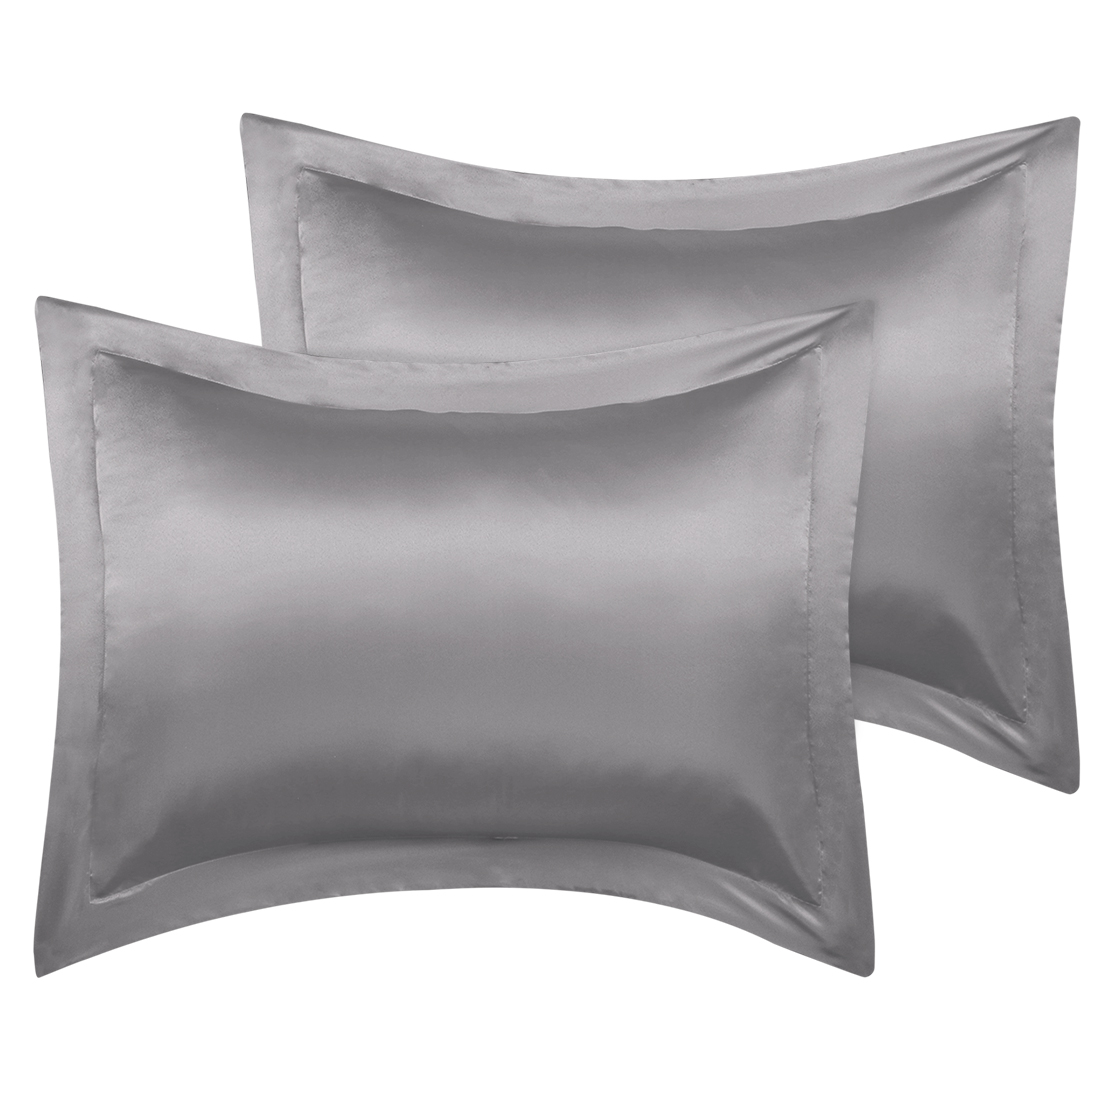 2 Pcs Grey Pillow Shams Satin Pillow Cases Standard Oxford Pillowcases